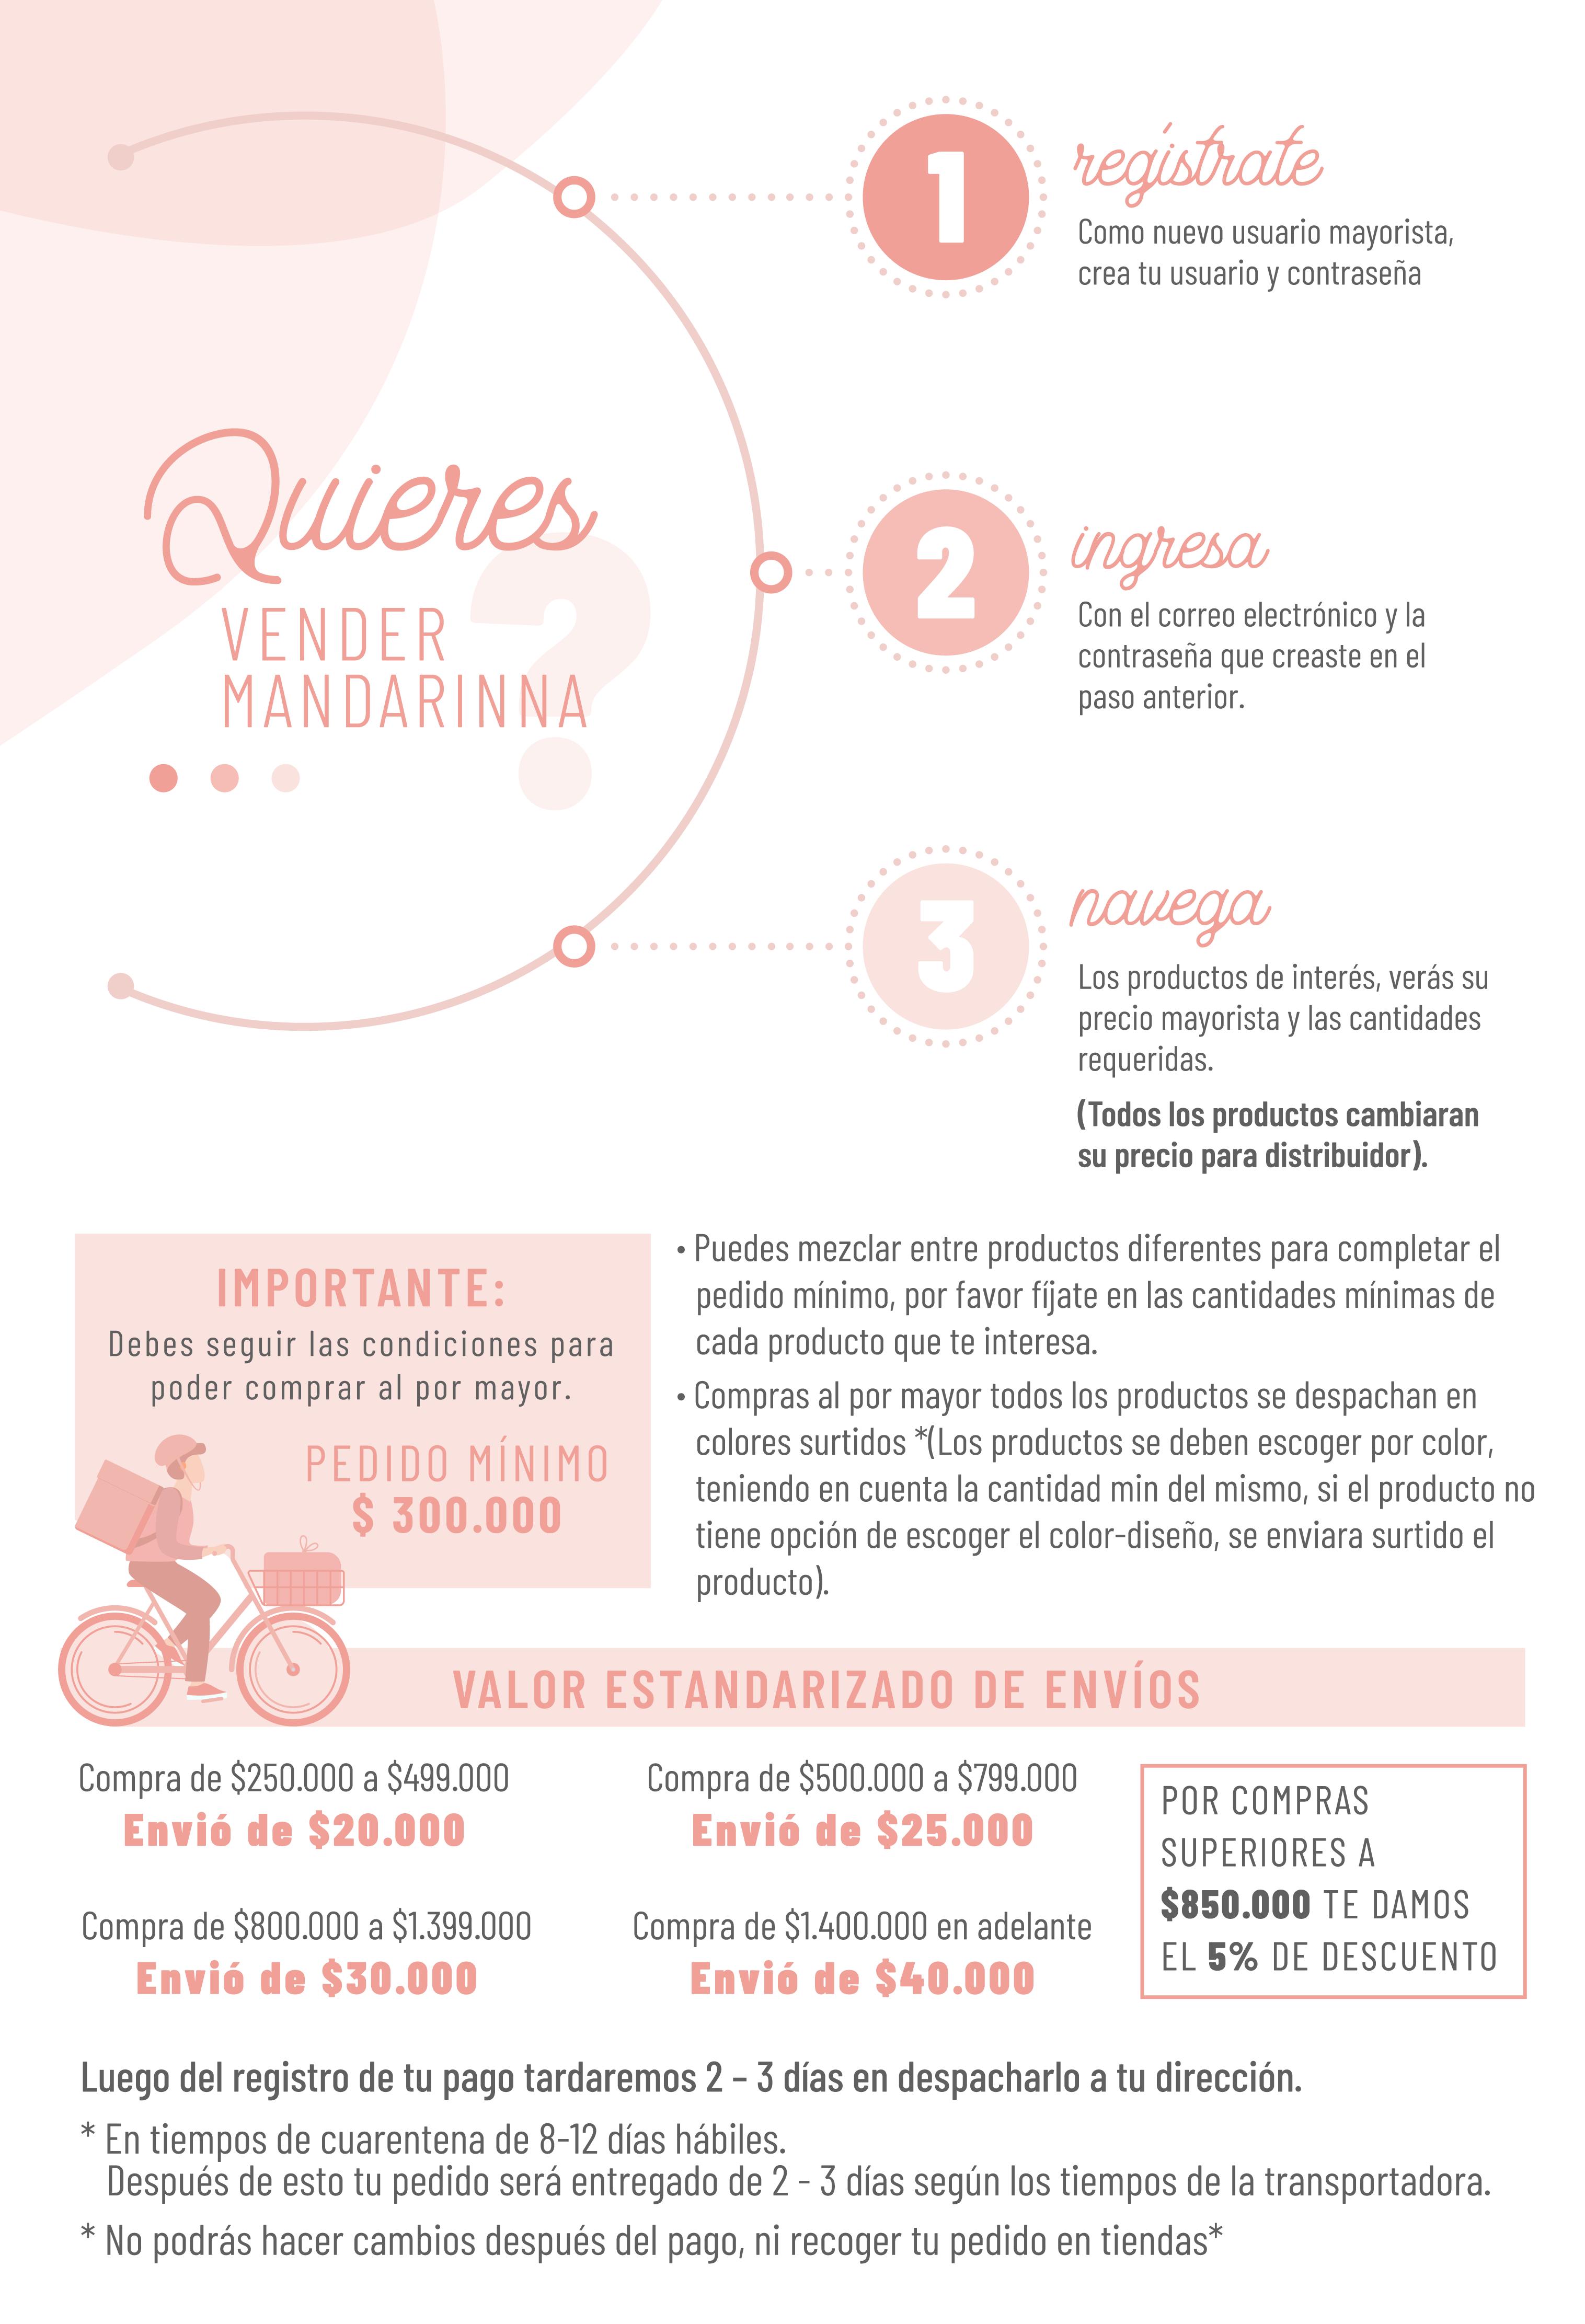 infografico-mayorista (2)